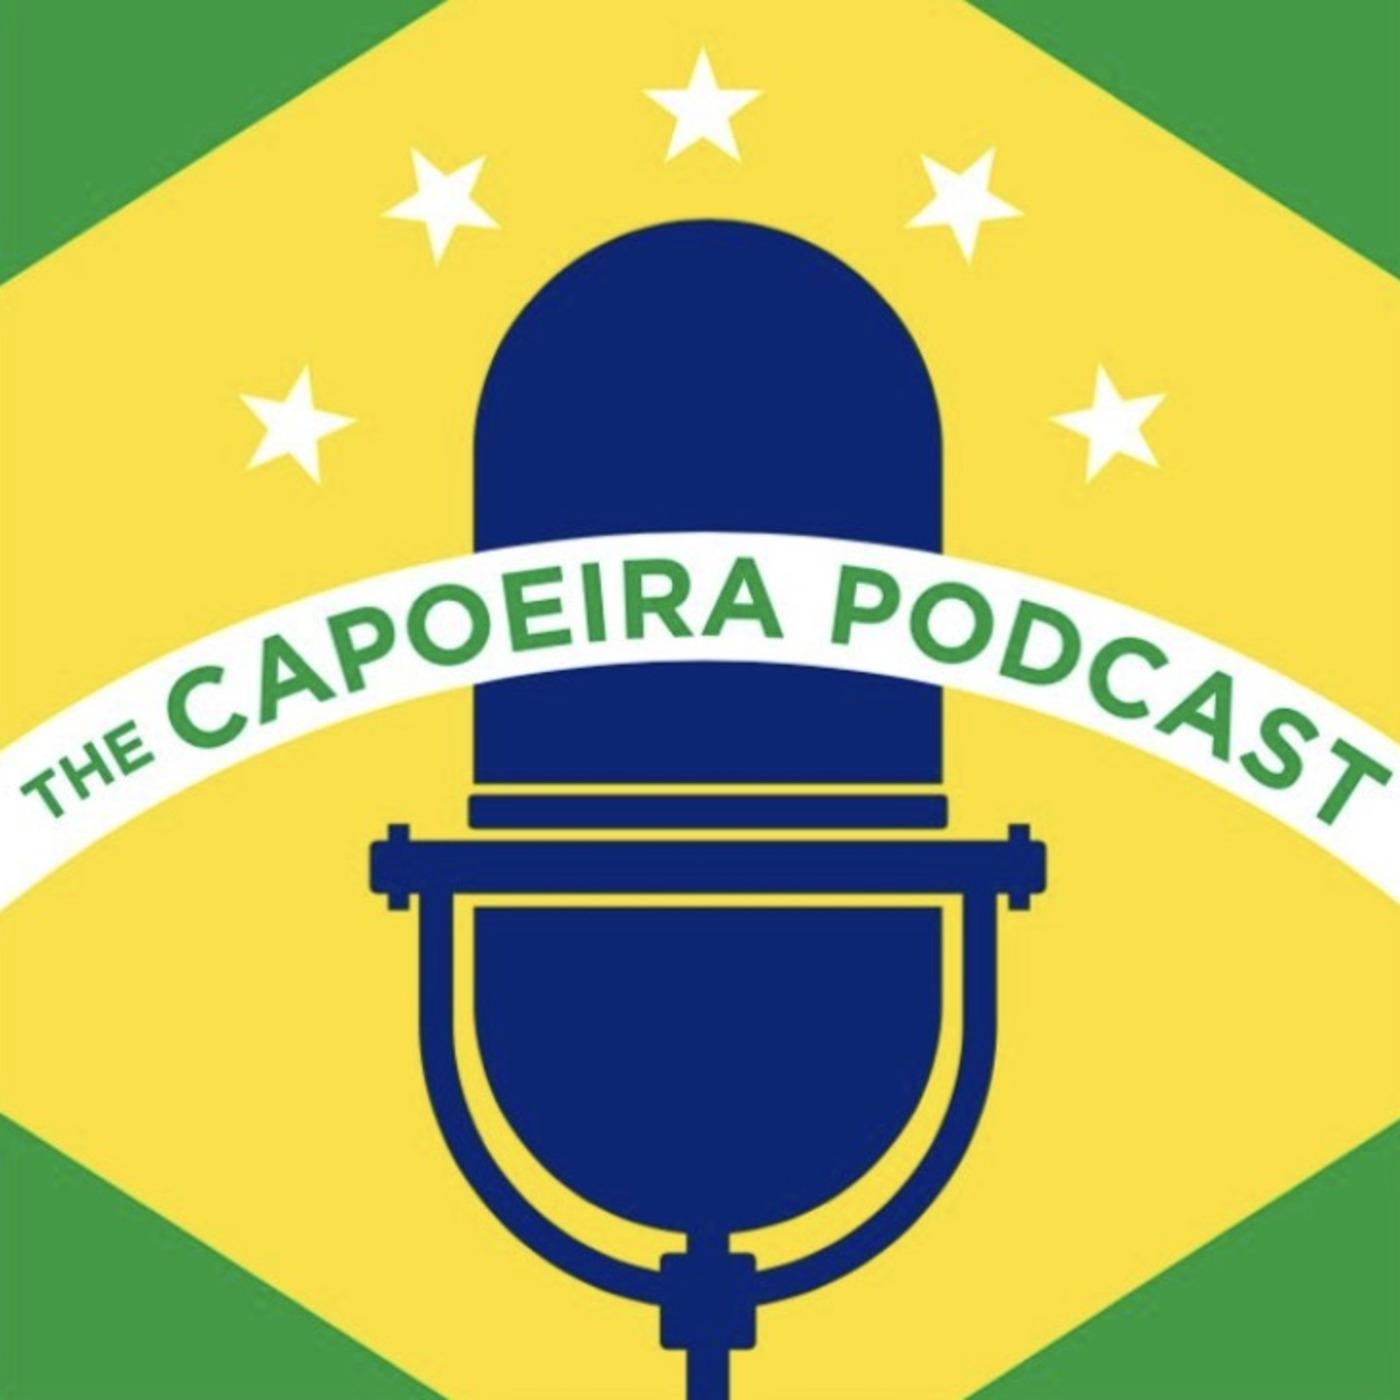 The Capoeira Podcast